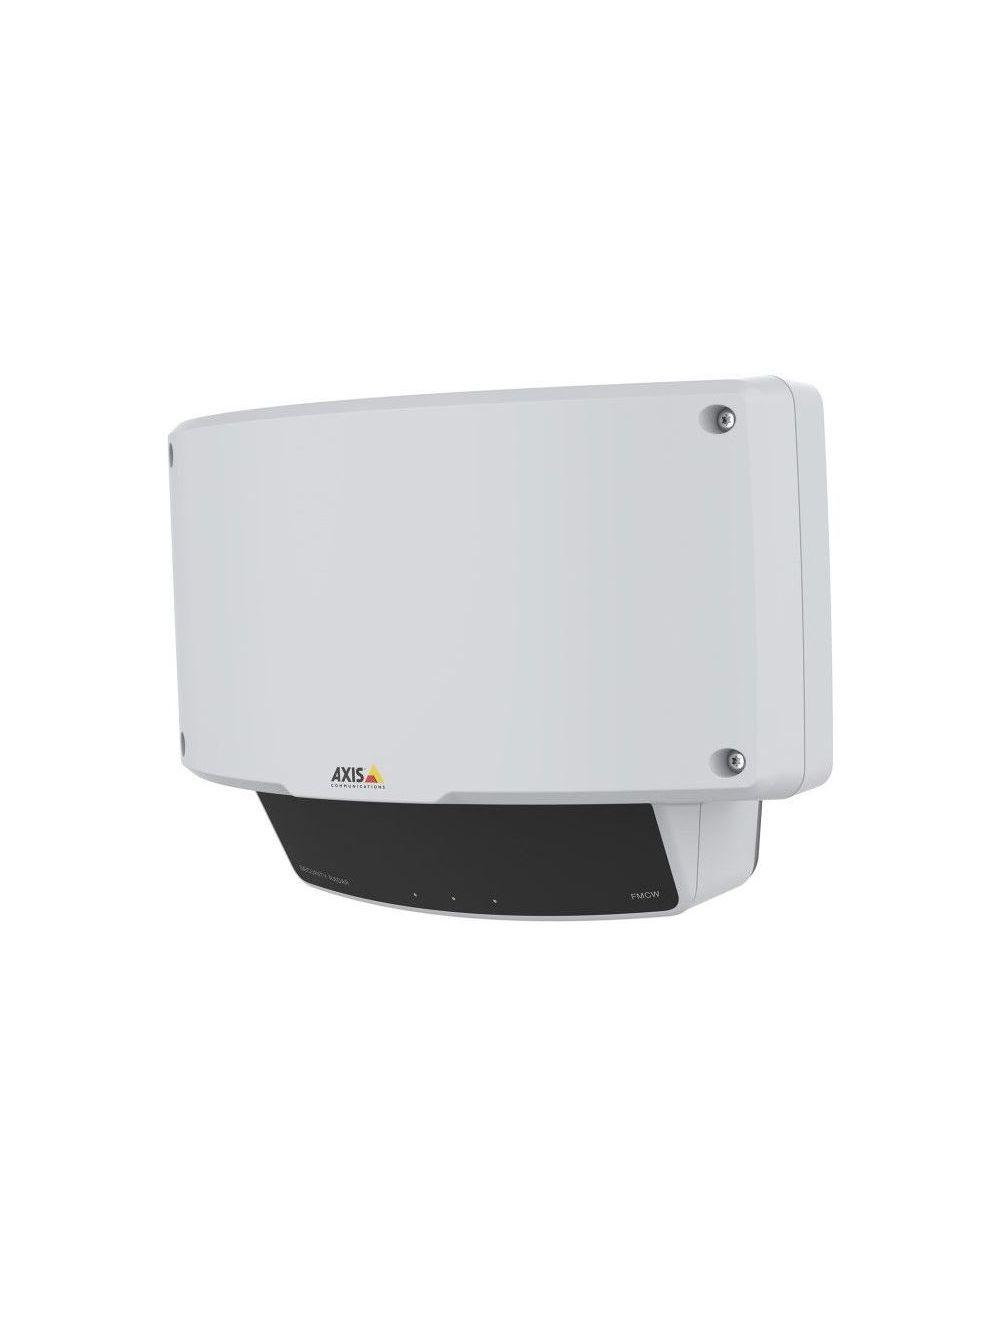 AXIS D2110-VE Netzwerk Radar Detektor